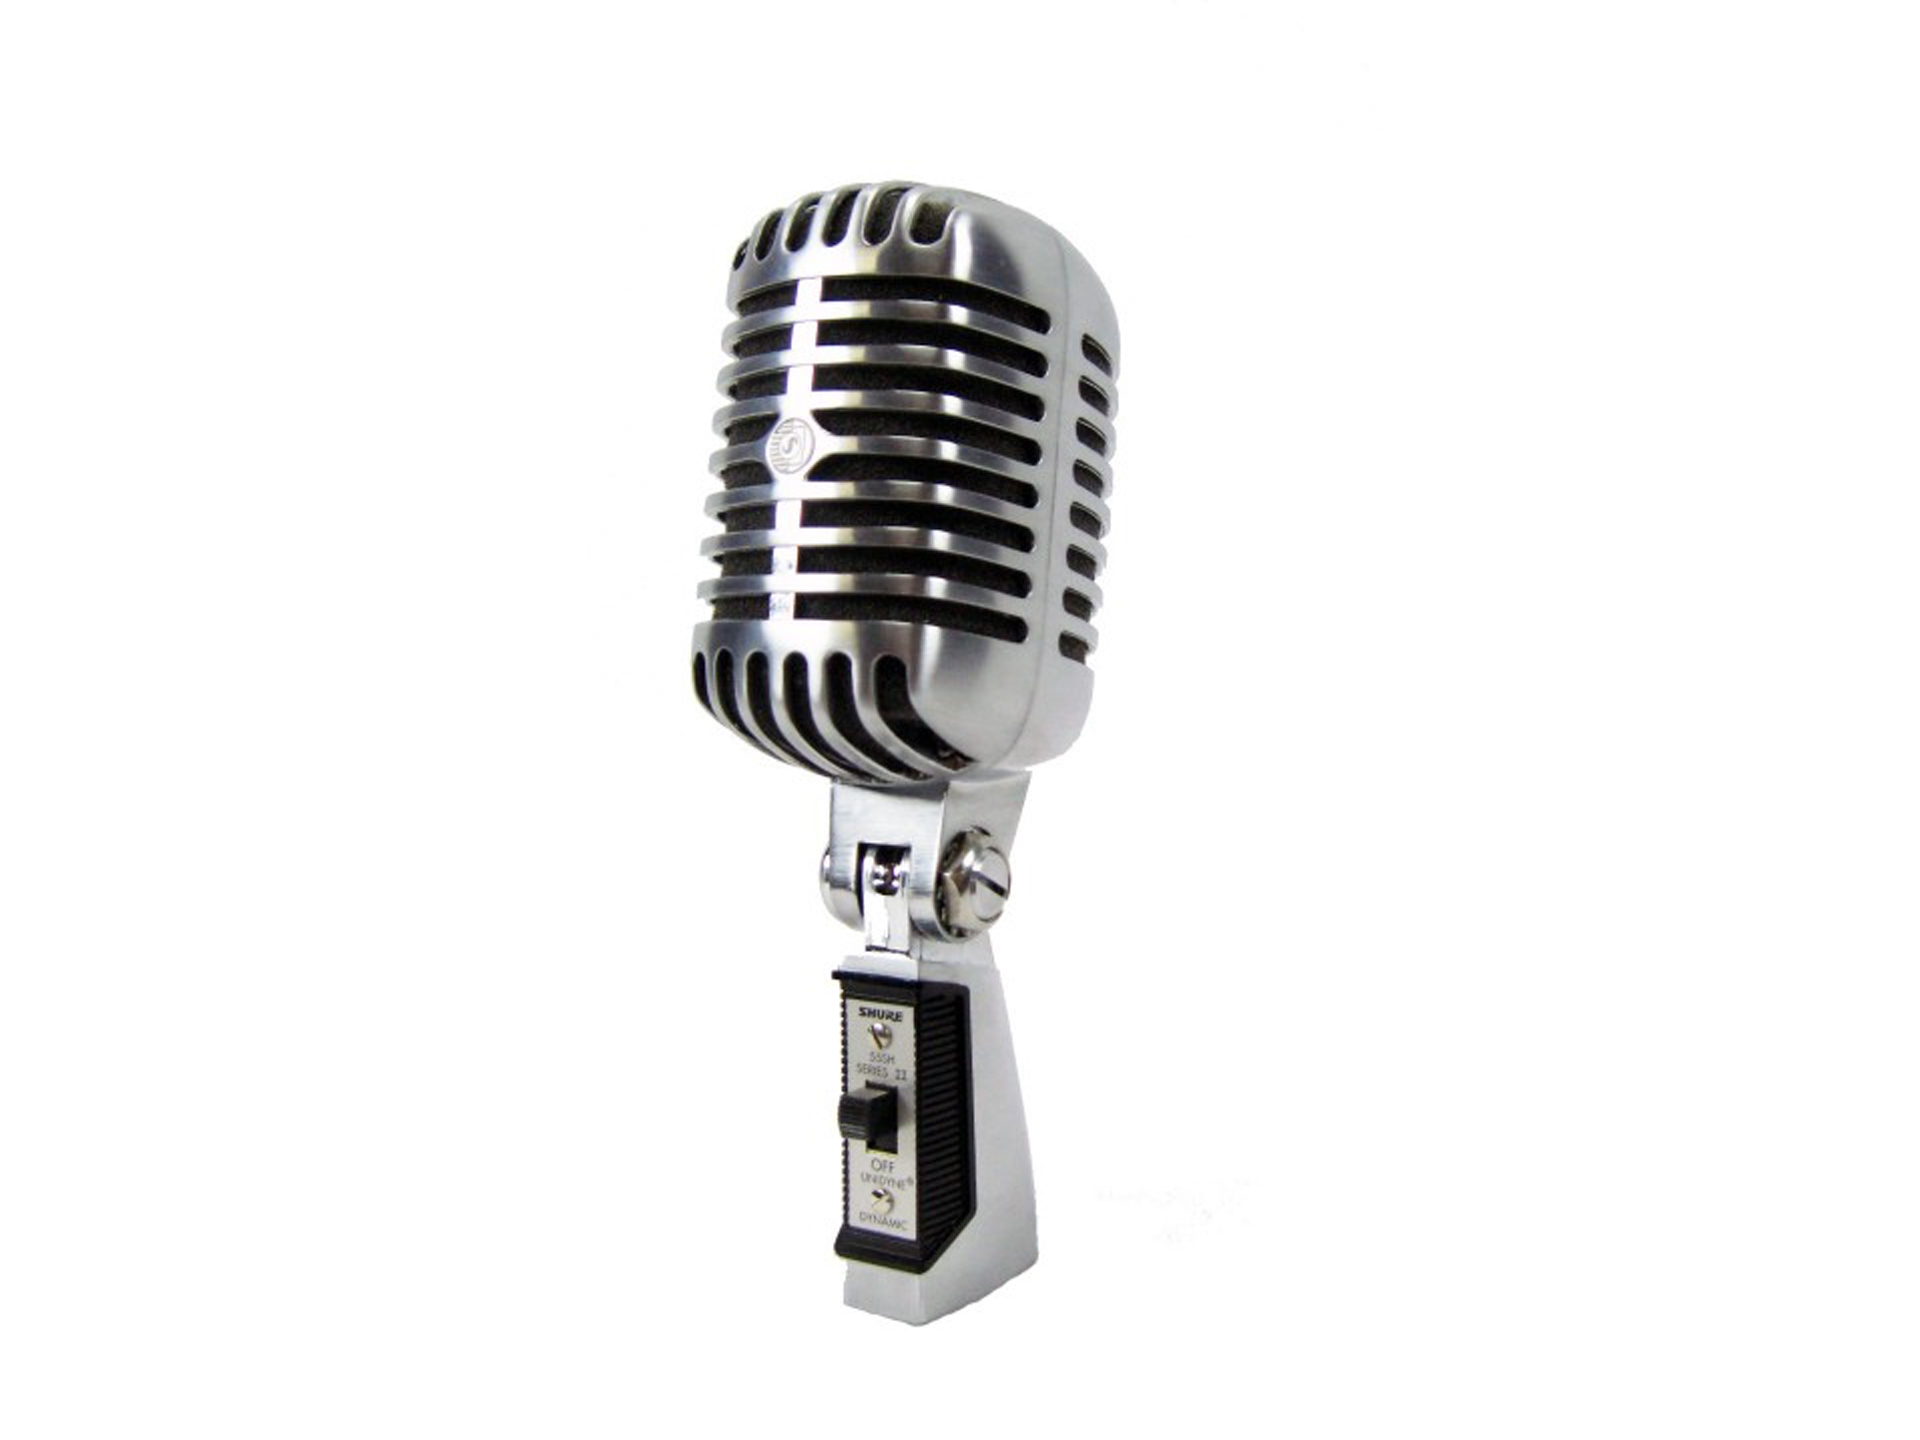 Master Partys vintage microfoon huren